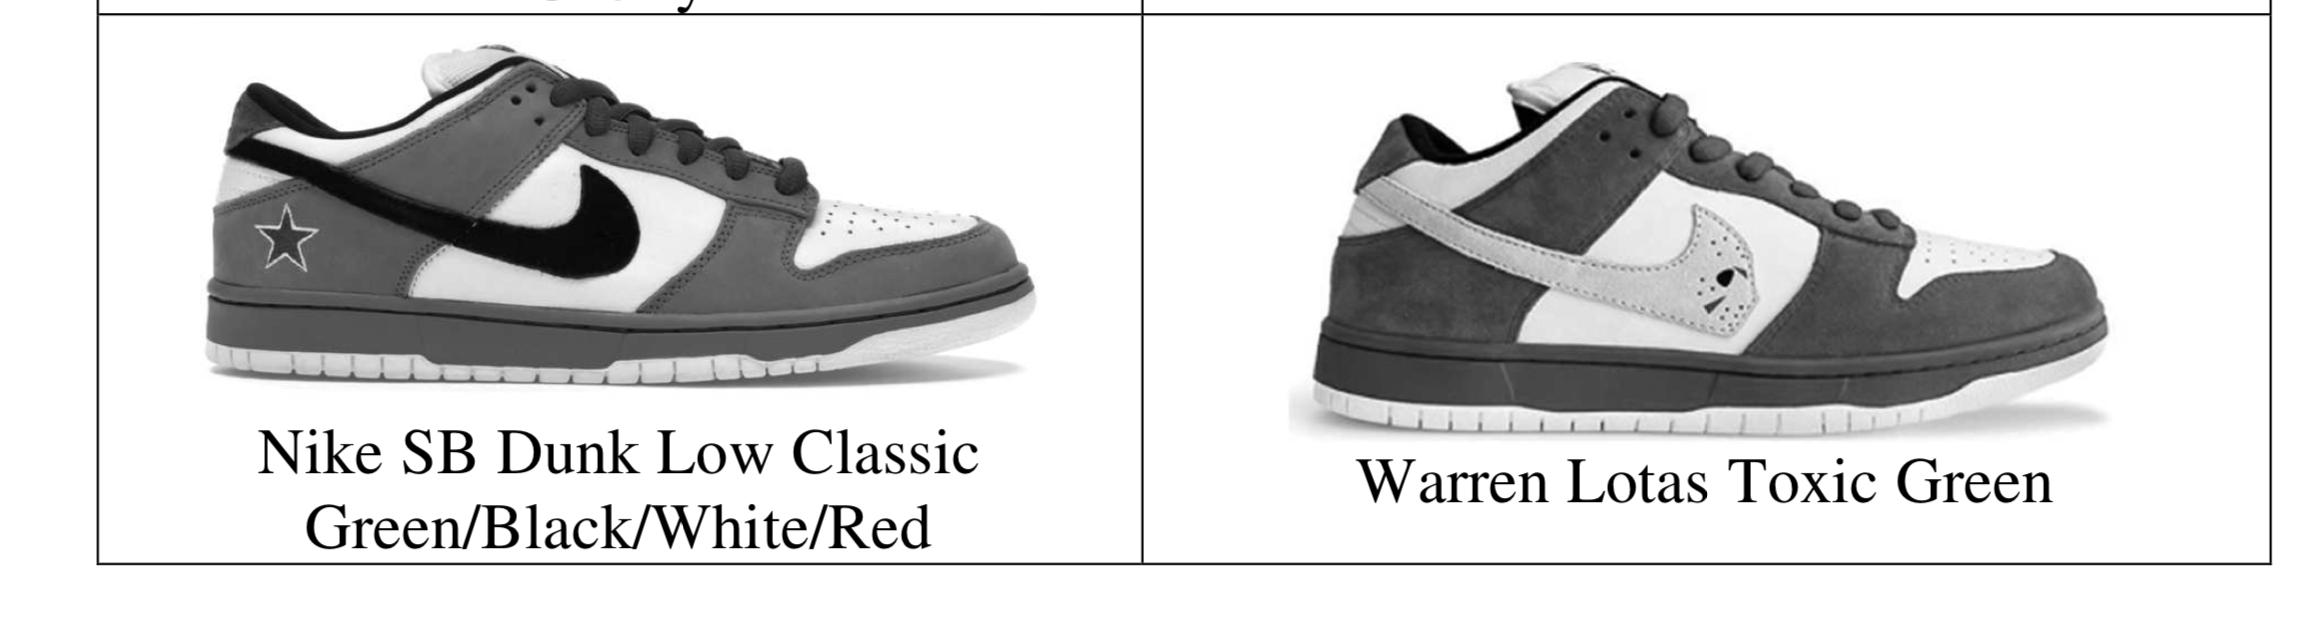 Nike sues Warren Lotas Nike Dunks